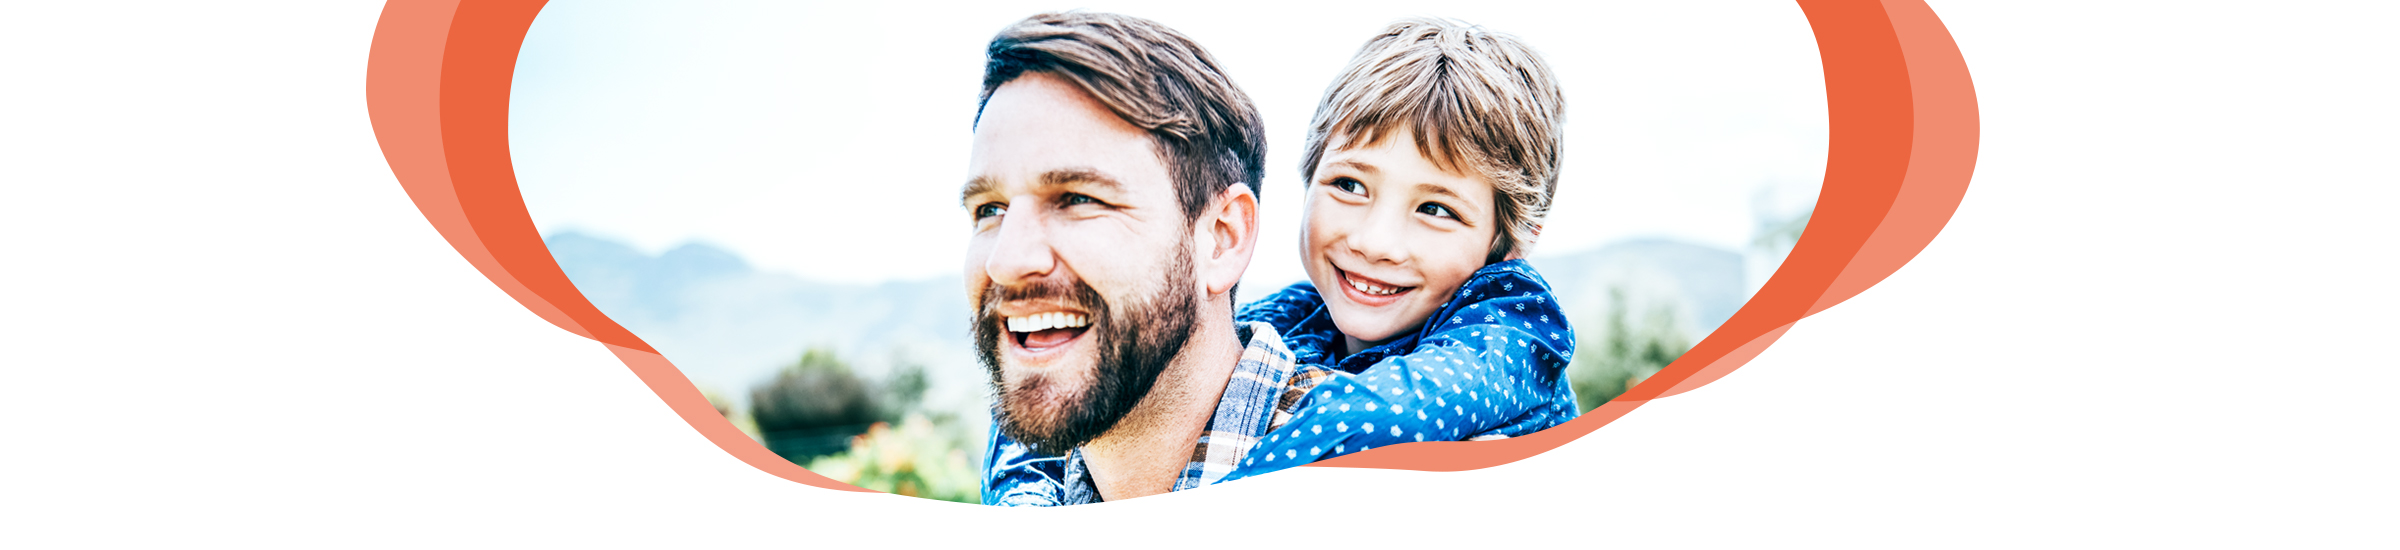 Vater mit Sohn - Heldenangebot